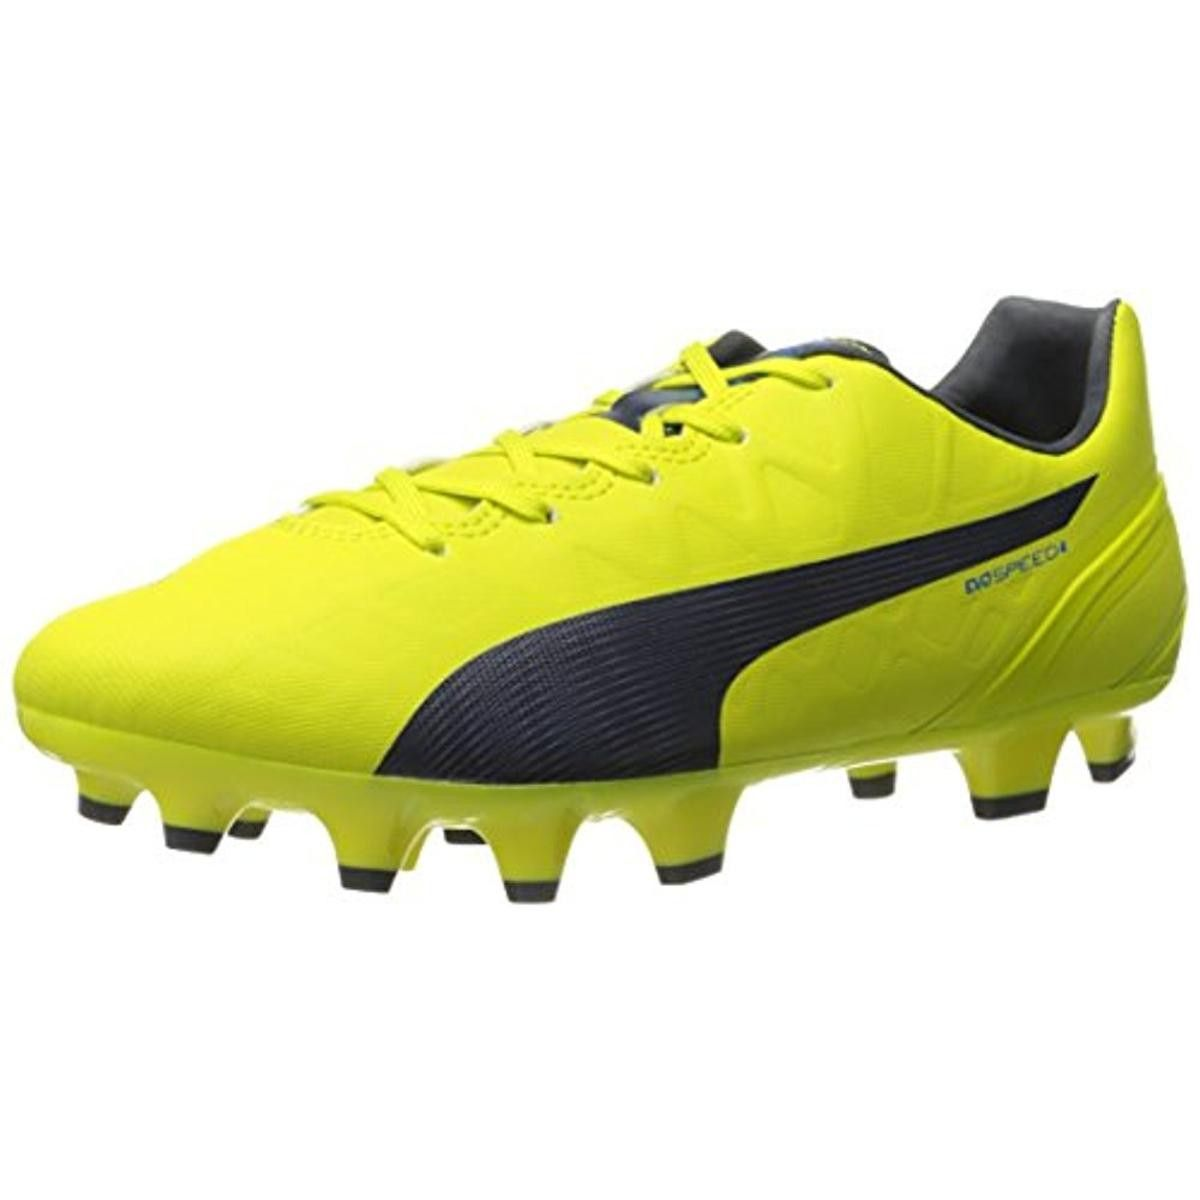 Lightweight Products Fg 4 Womens Evospeed Puma Soccer 4 Cleats qO7xA